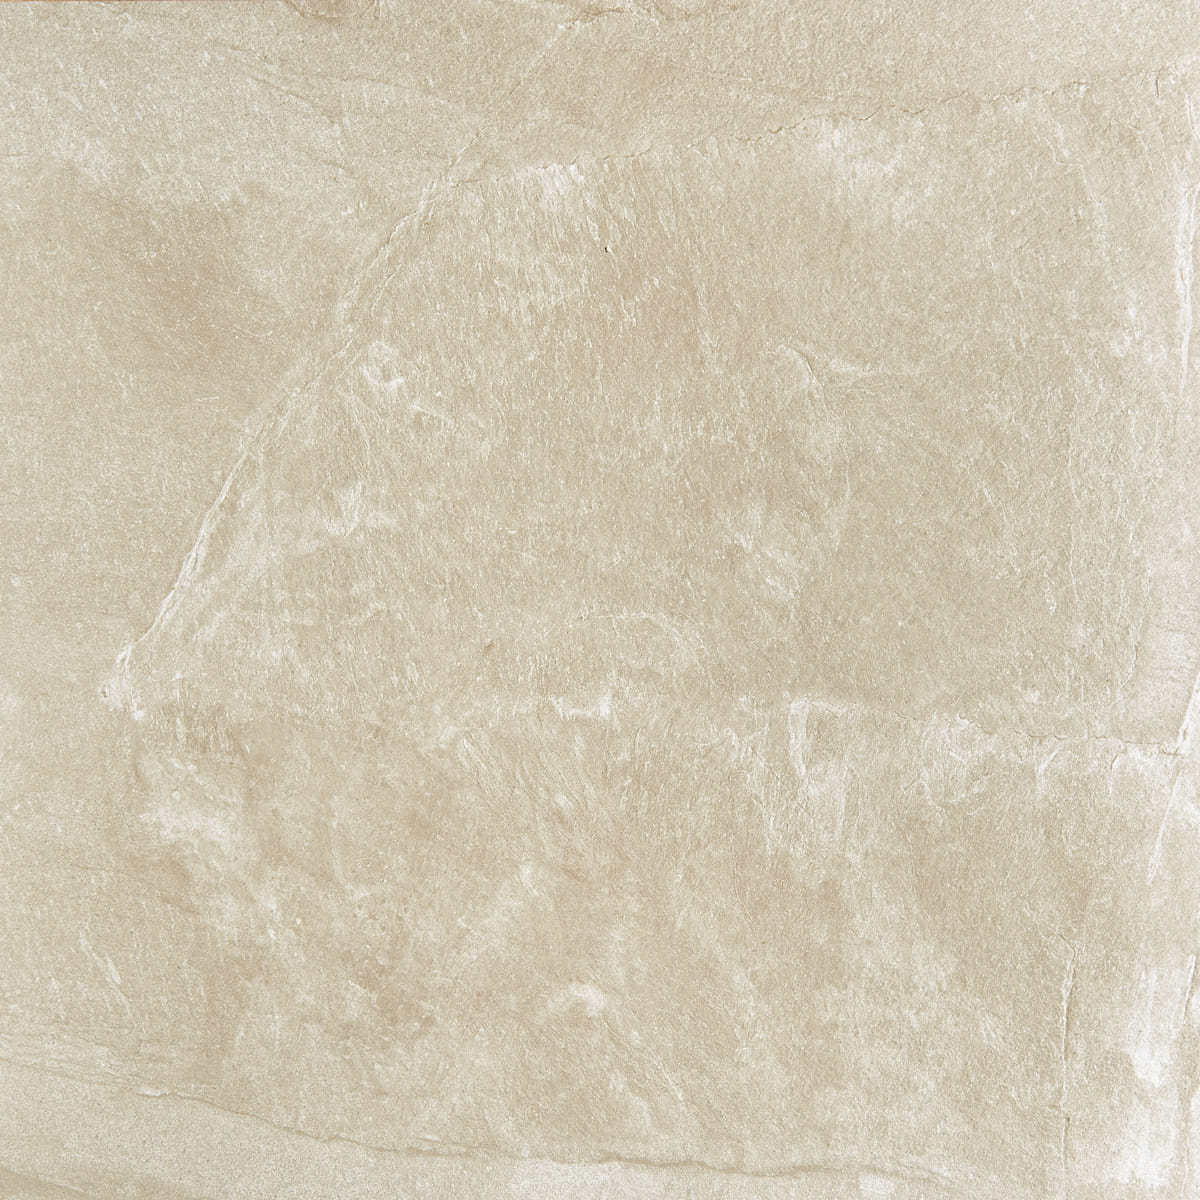 FOTO 1 sandstone ivory ant 75x75 3